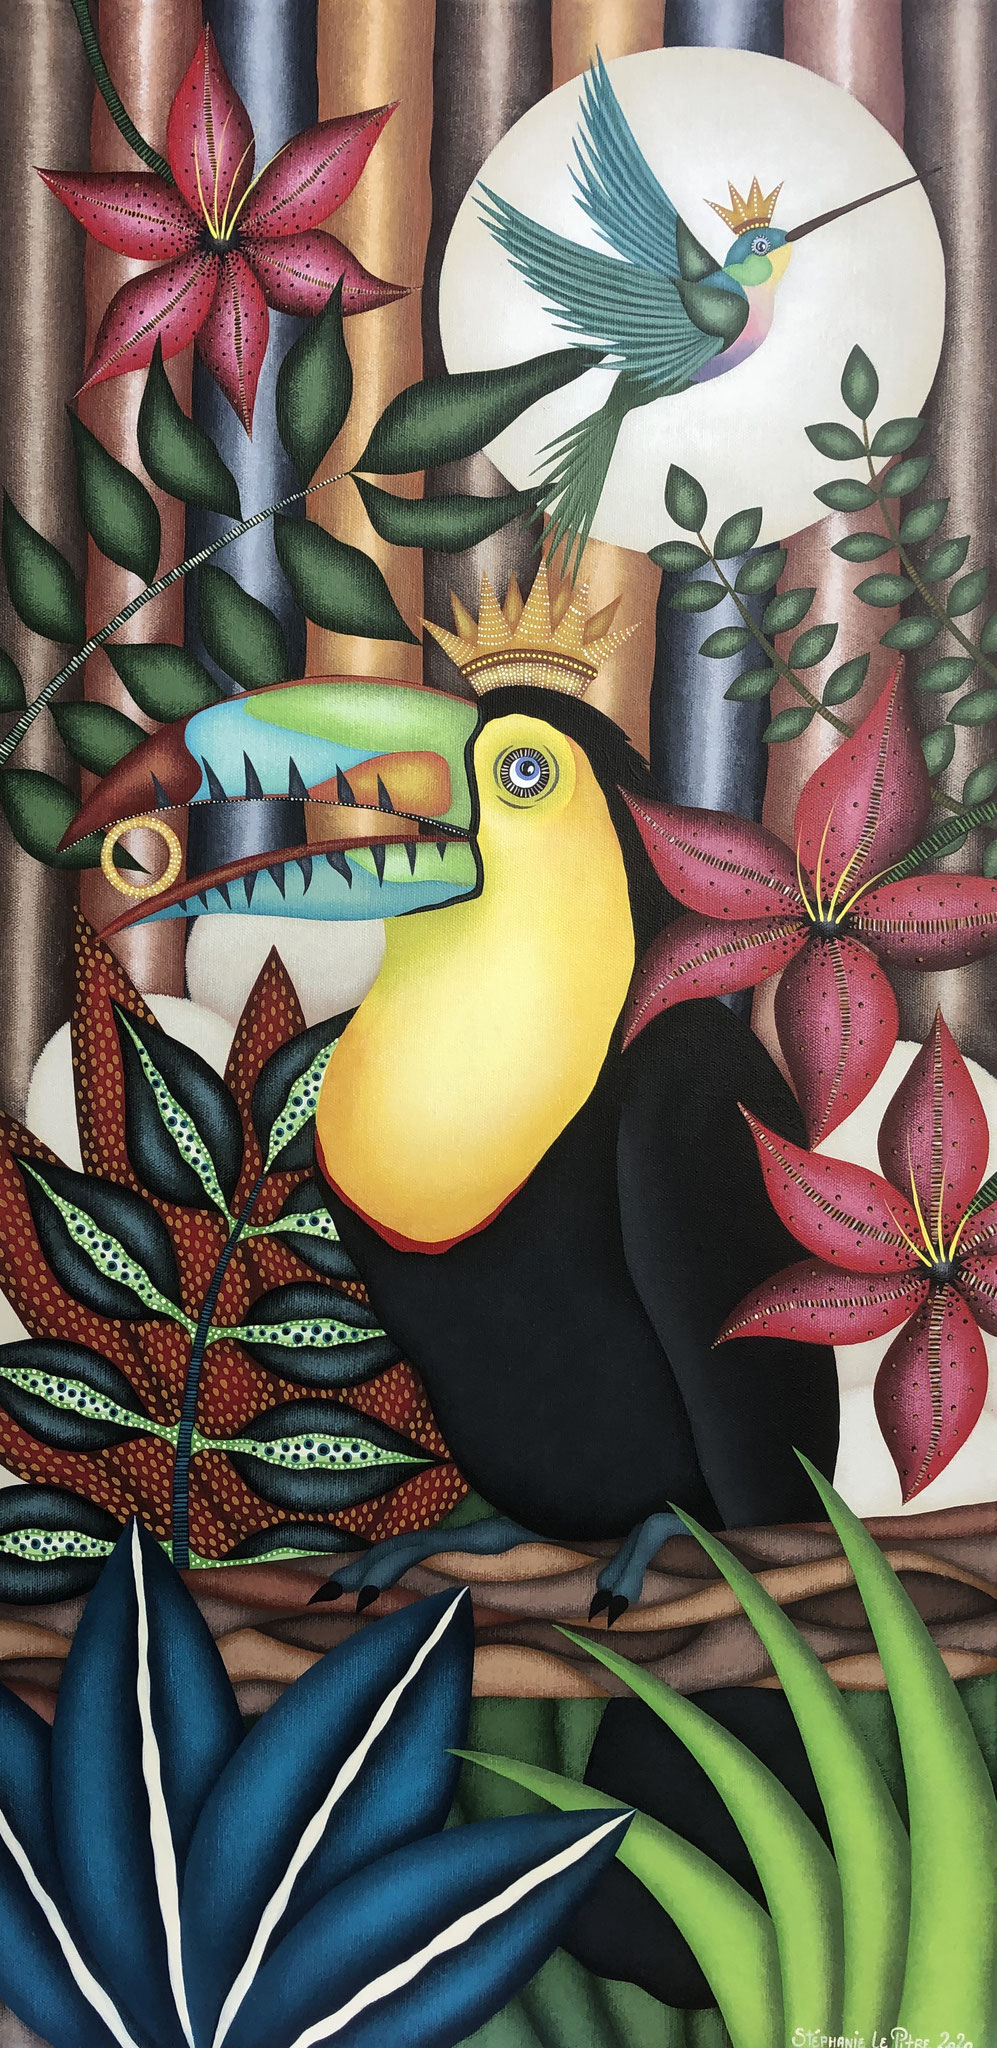 Le Malicieux (40 x 80)